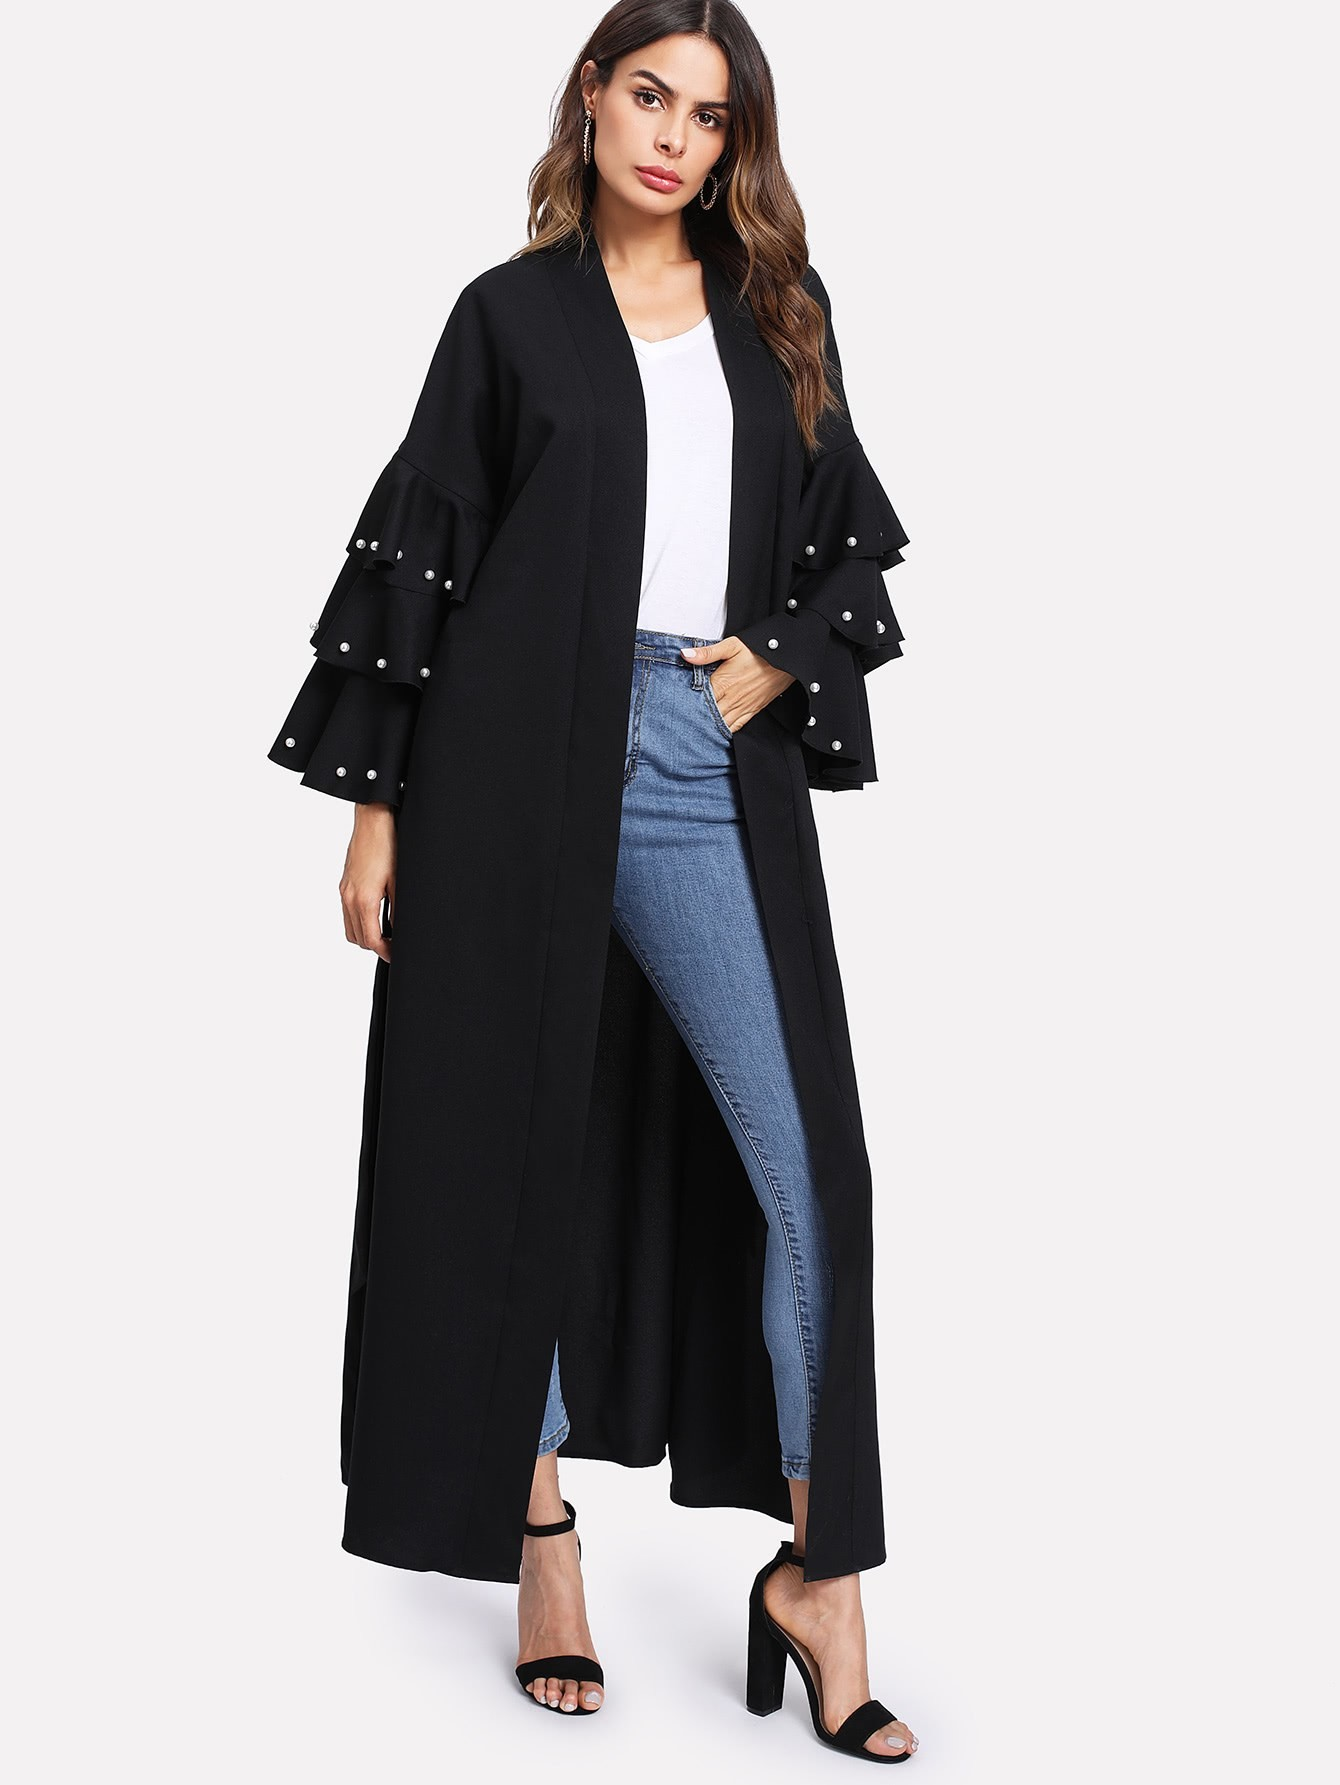 Pearl Beading Layered Sleeve Belted Abaya